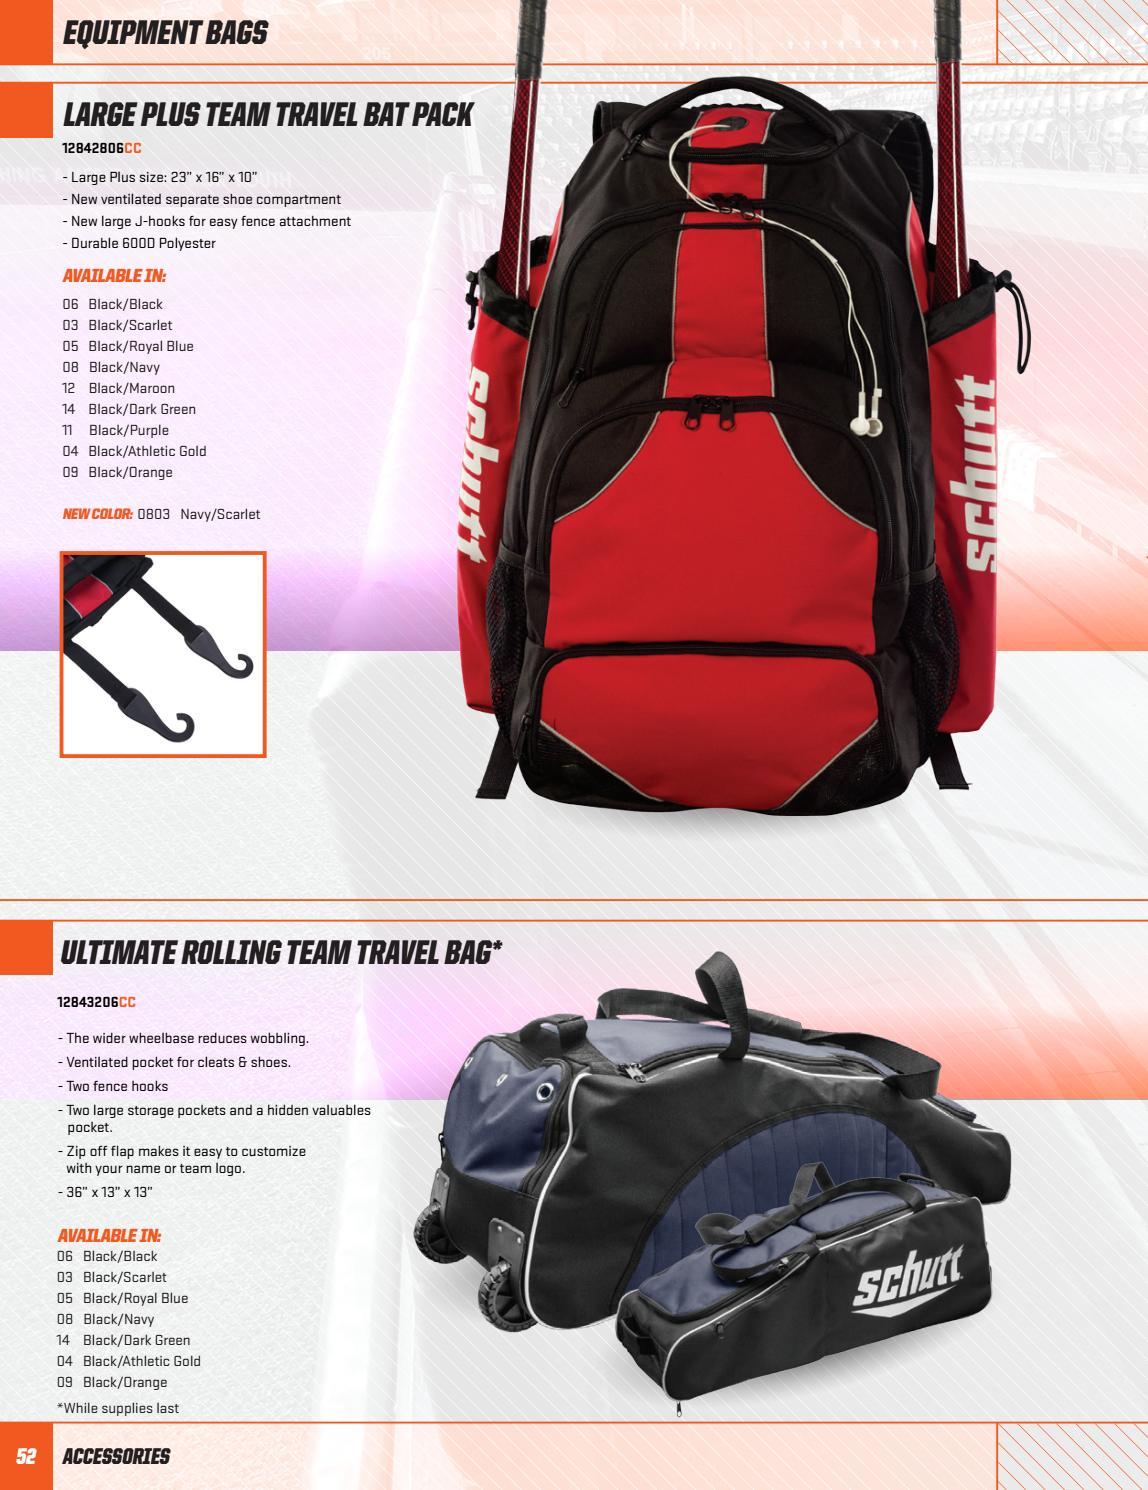 668802fa497e Schutt Baseball Softball Catalog 2018 by LTS - Legacy Team Sales - issuu